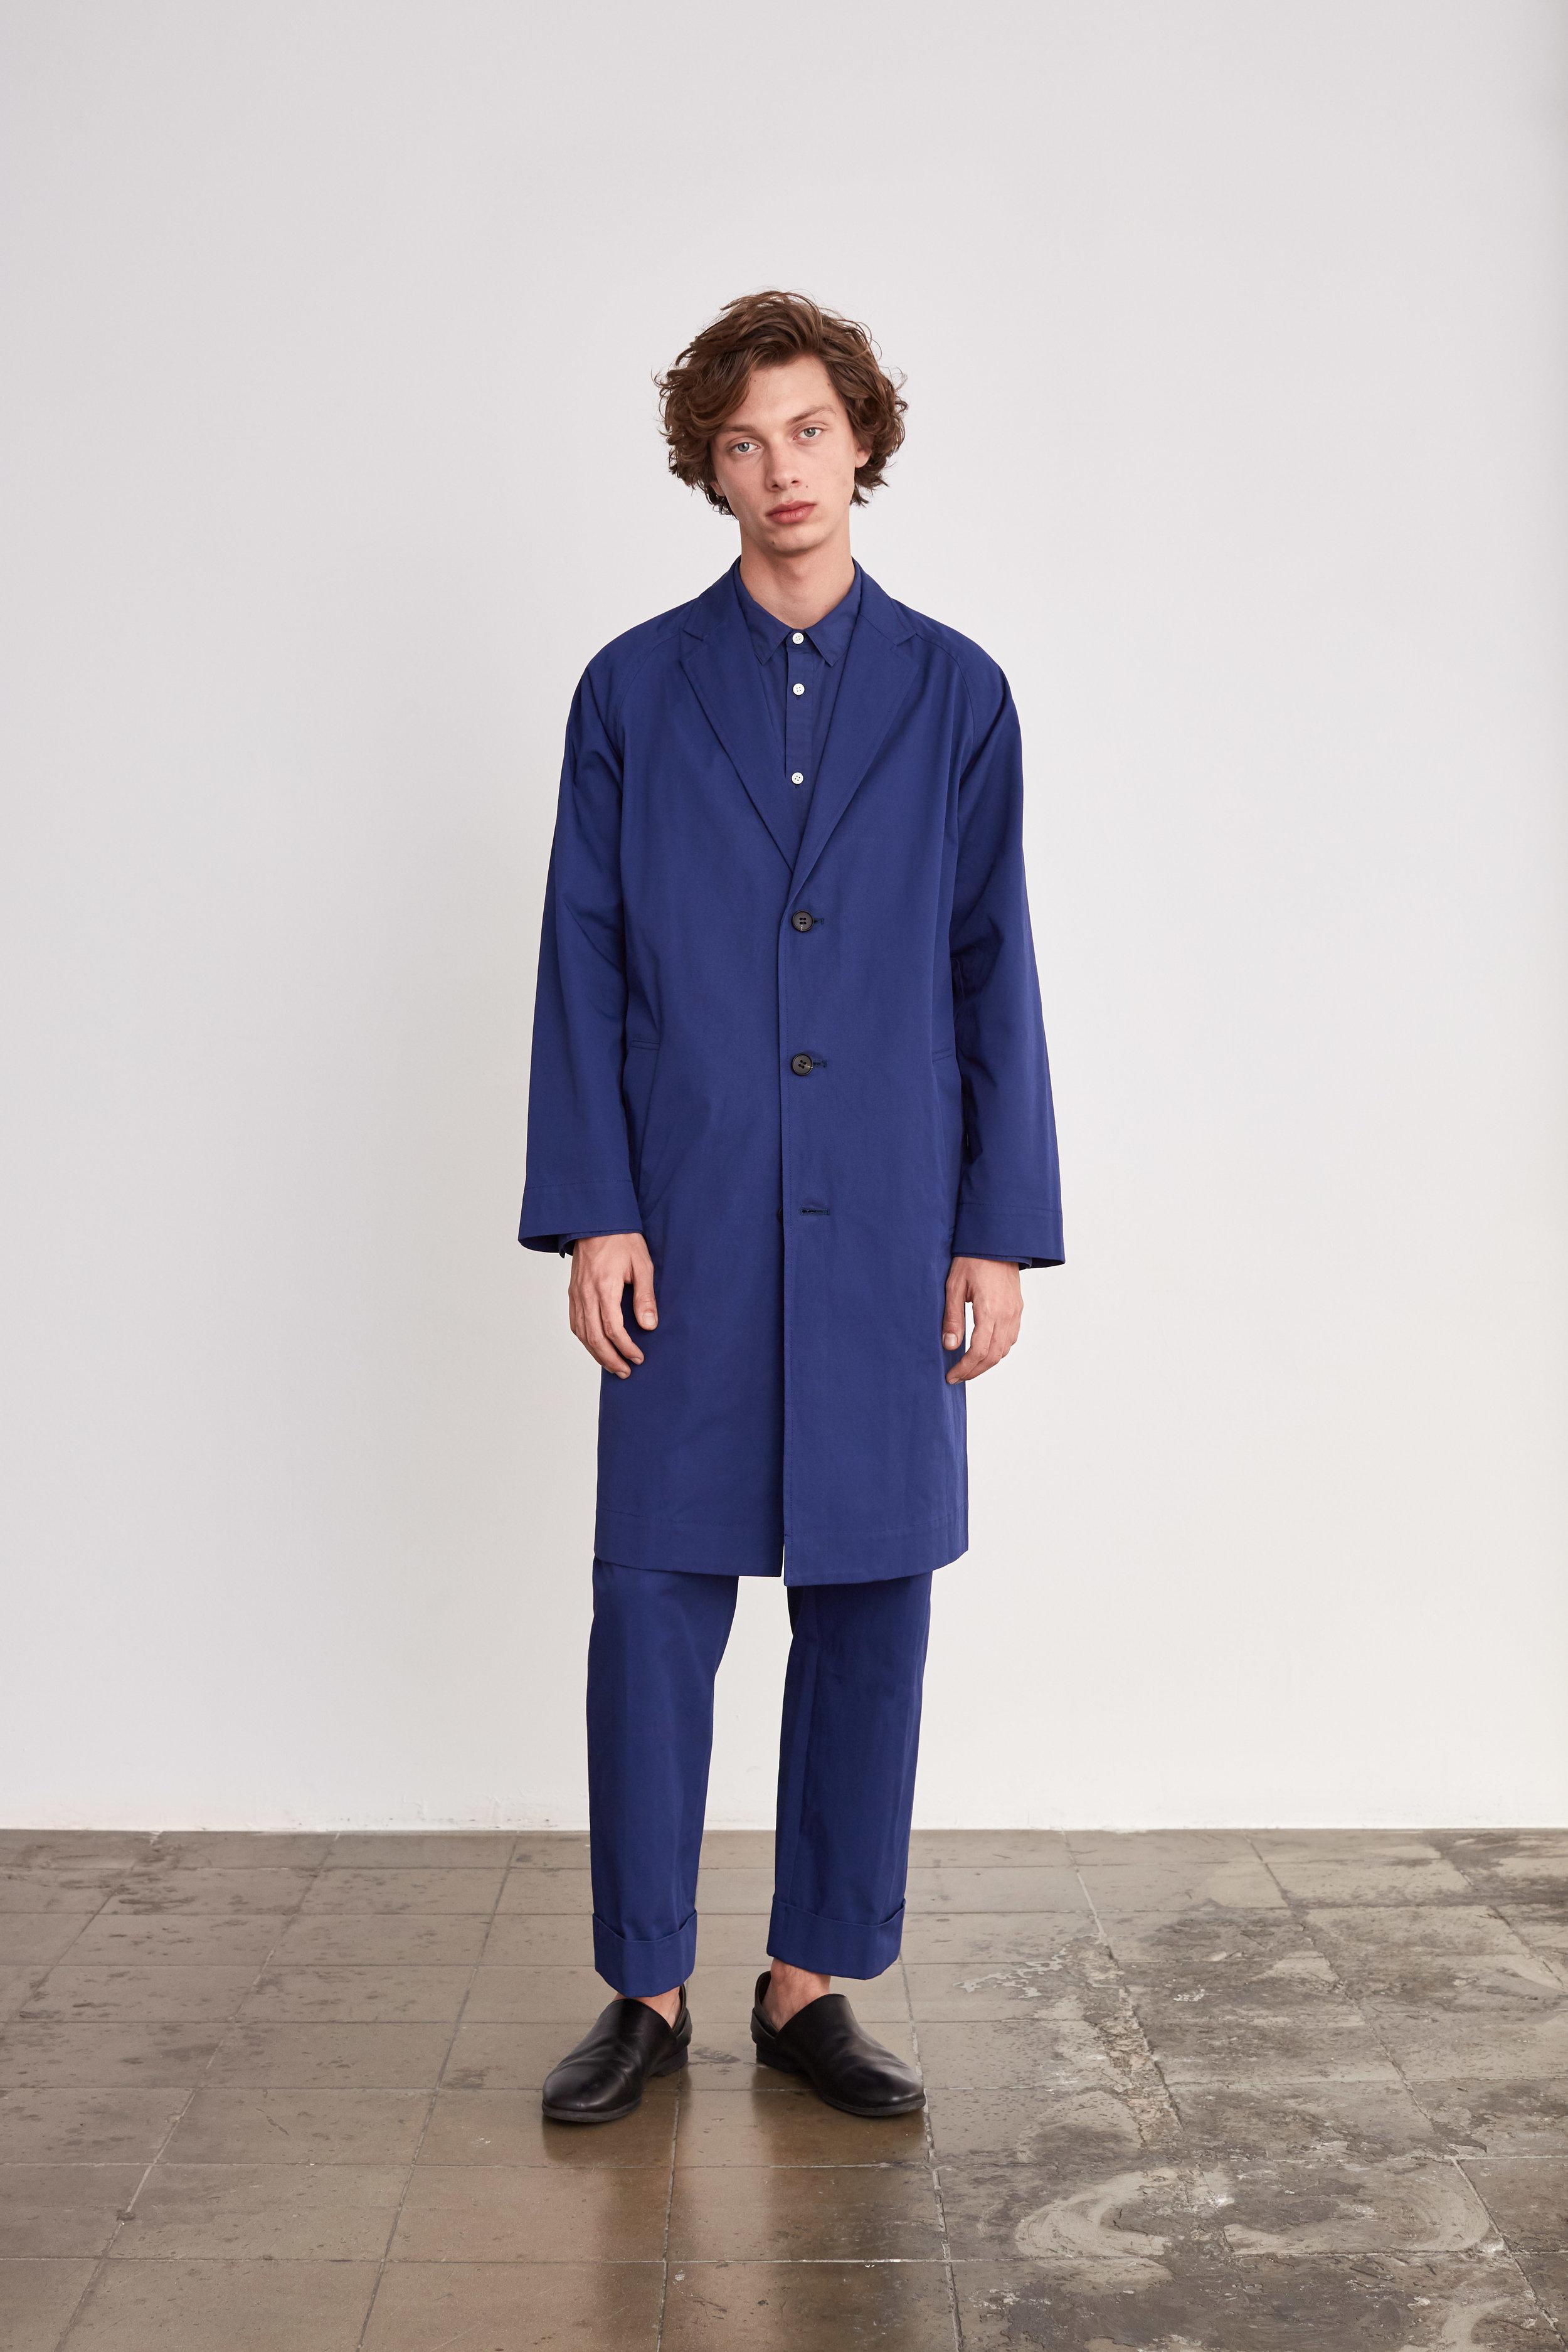 <b>5</b><br>Victor Typewriter Shirt<br>Austin Cotton Pants<br>Donald Cotton Coat